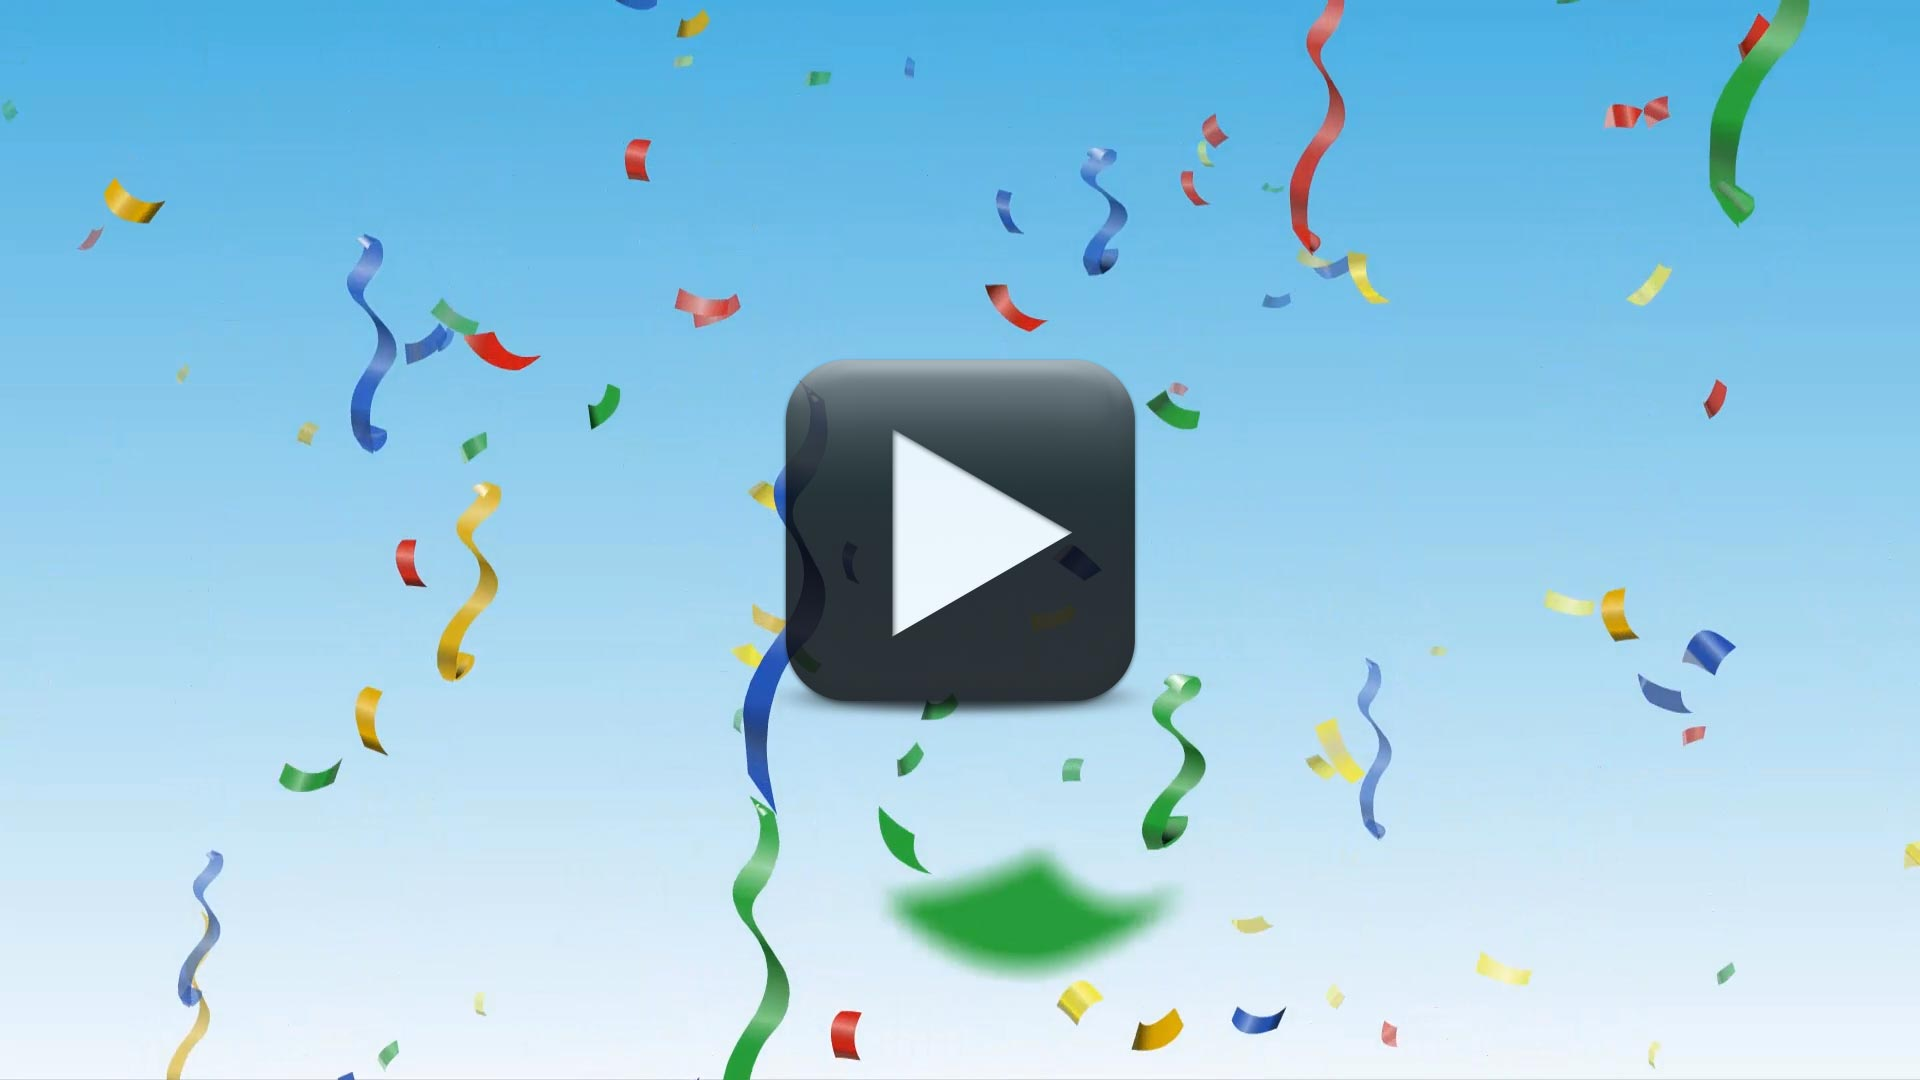 Confetti Video Background Full HD-Animated Celebration